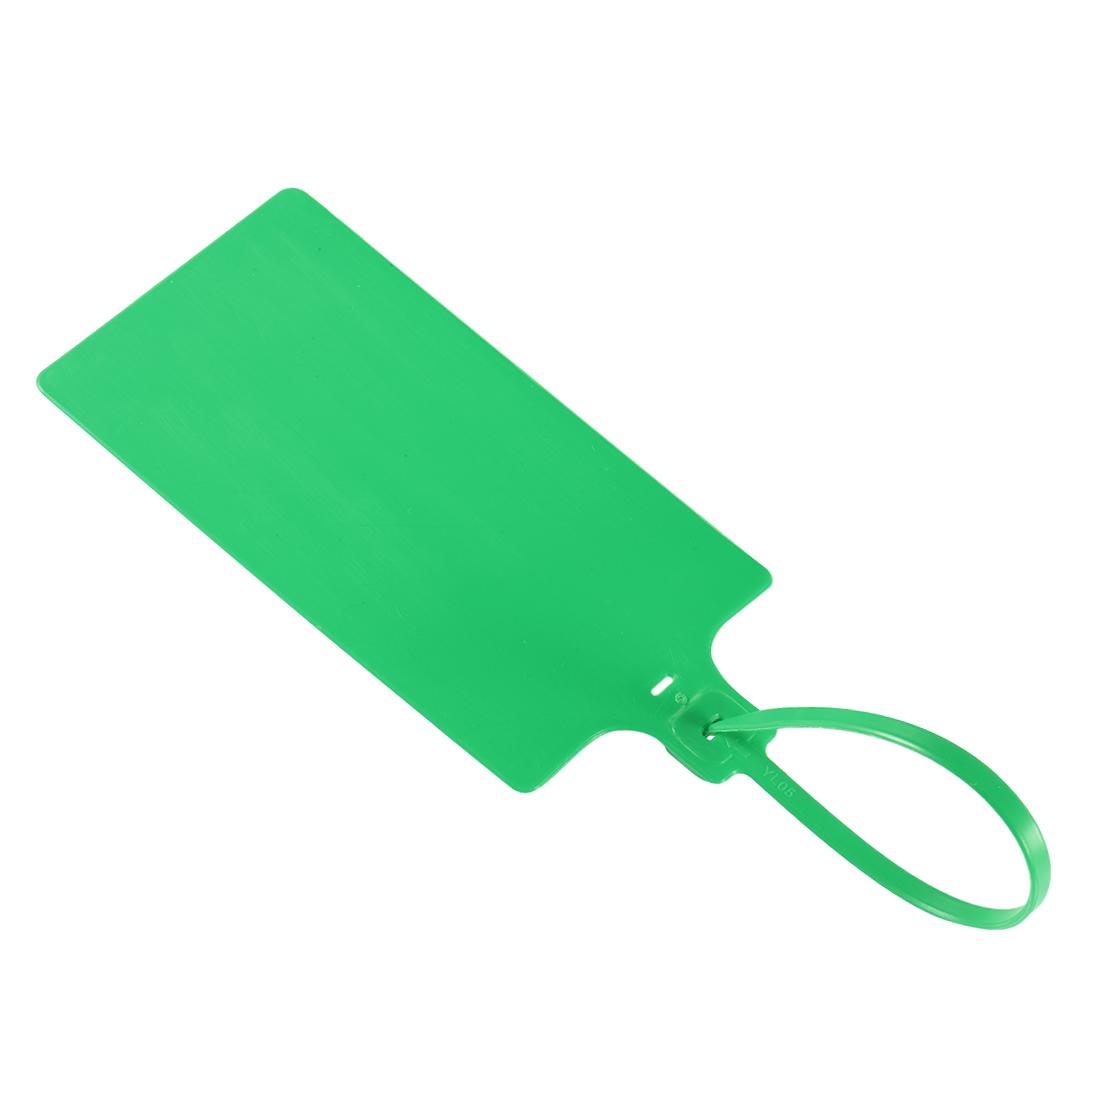 Plastic Zip Ties Seals Anti-Tamper 255mm Length, Green, Pack of 20